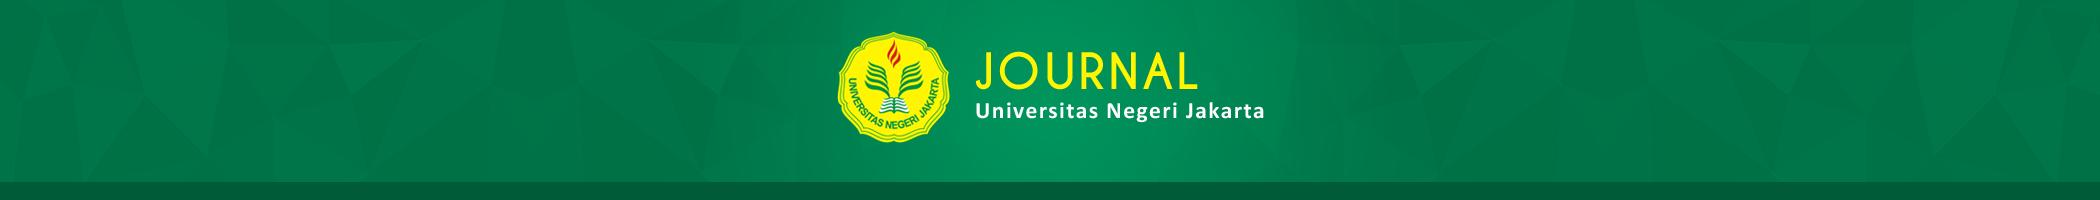 banner-journal